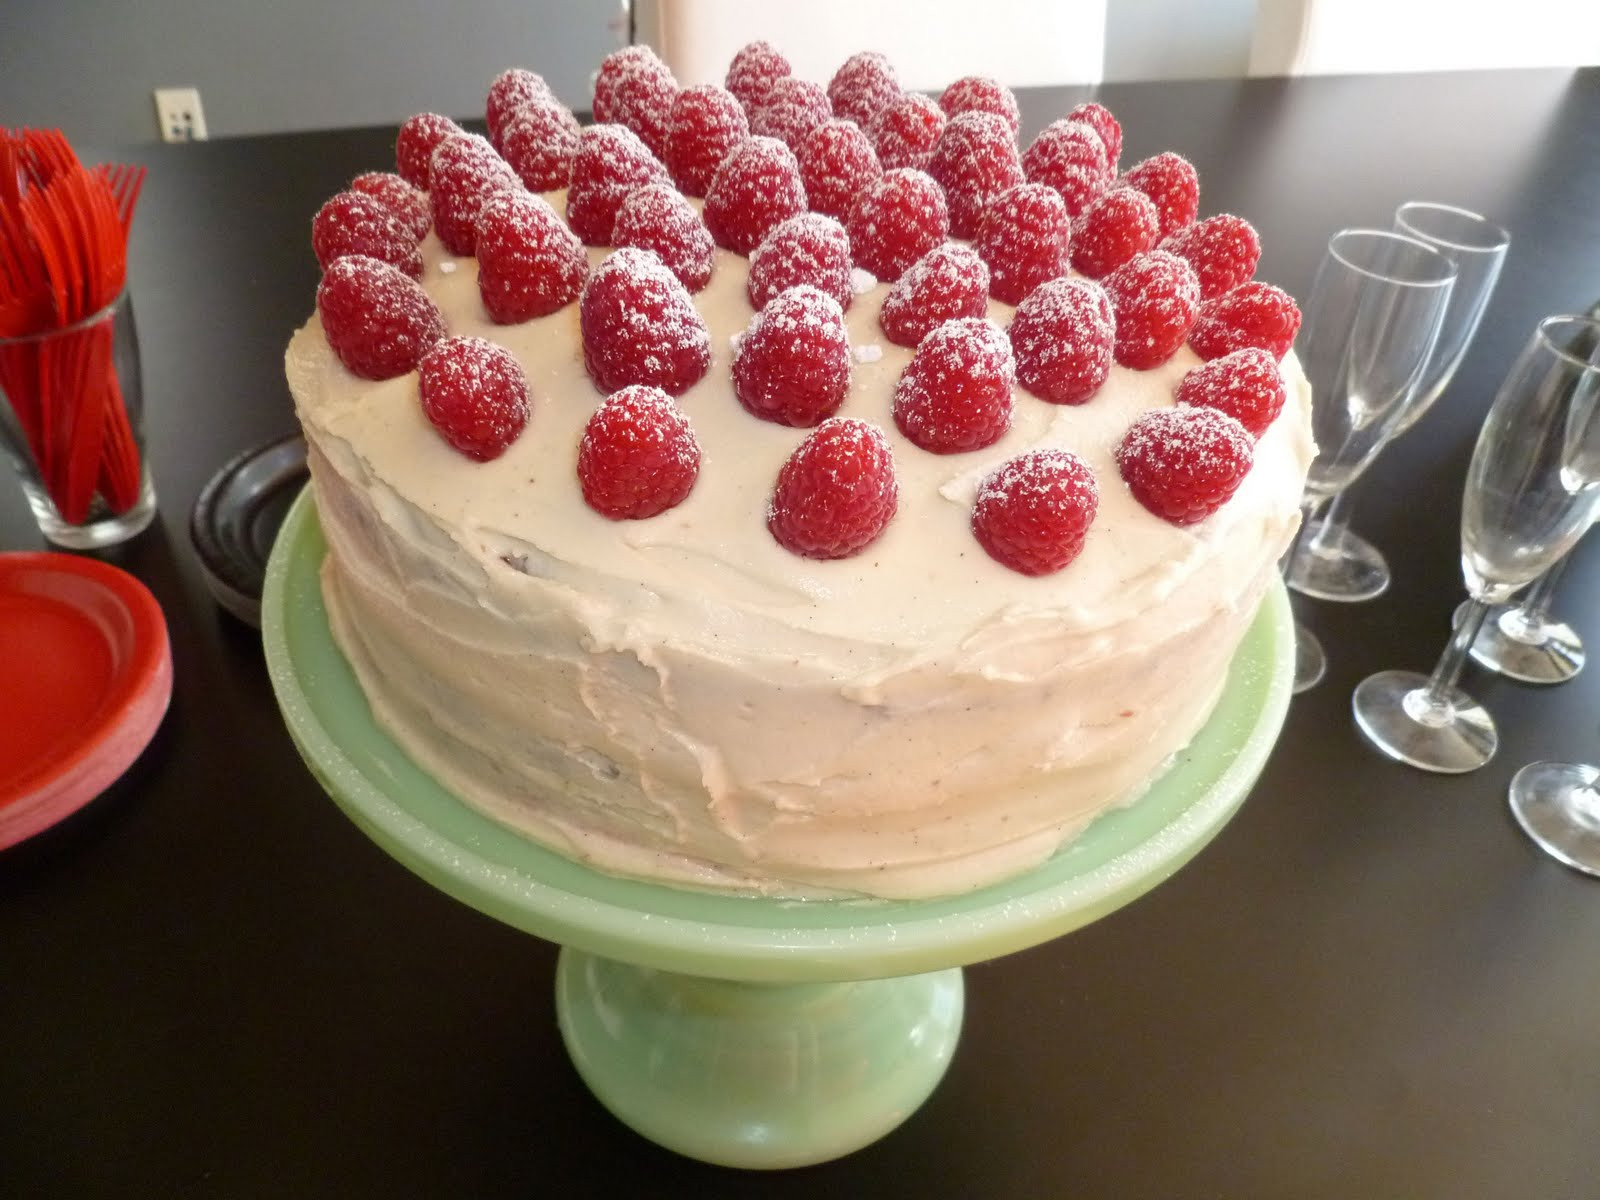 Best ideas about Vegan Birthday Cake Recipe . Save or Pin Savvy Vegan Homemade Vegan Birthday Cakes Now.